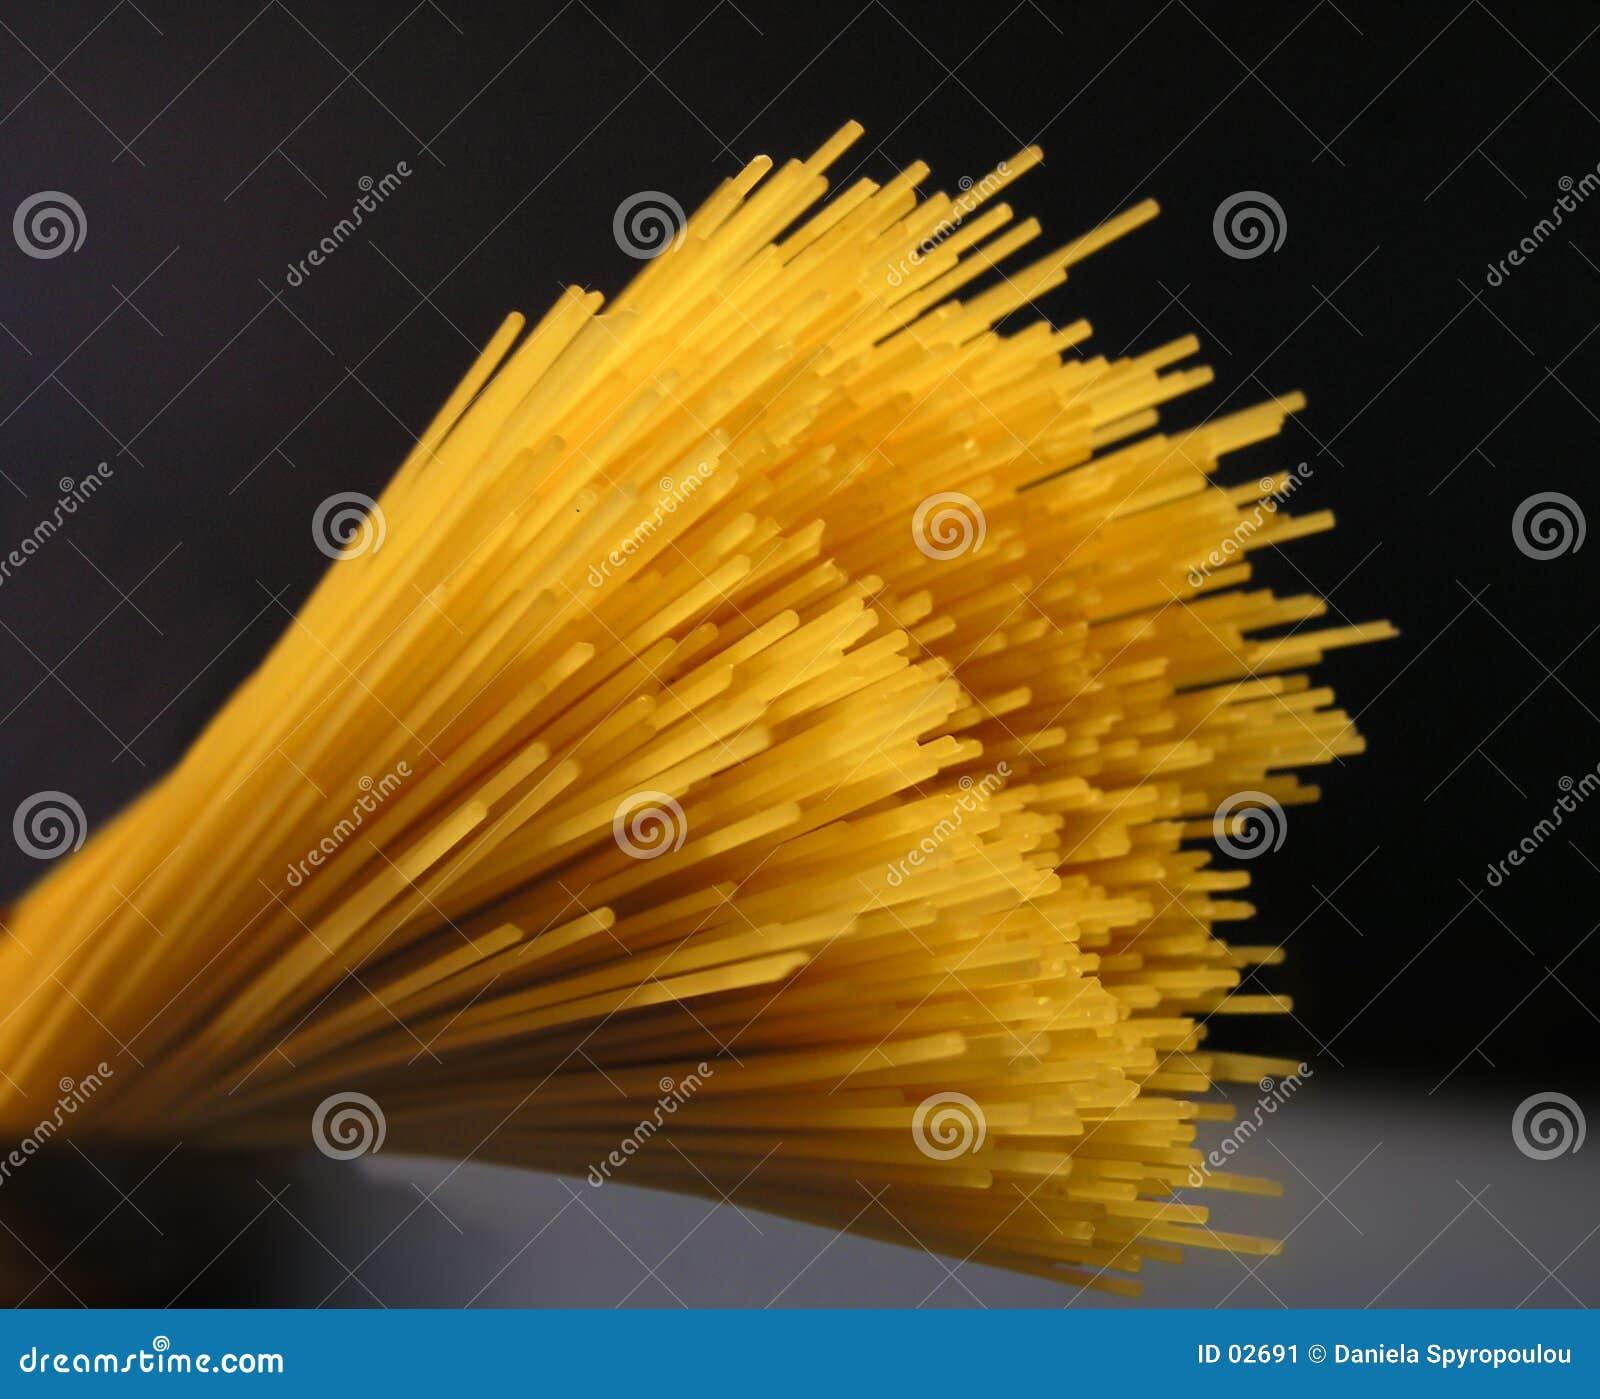 Download μακαρόνια στοκ εικόνα. εικόνα από δημητριακά, σιτηρέσιο, ιταλικά - 2691